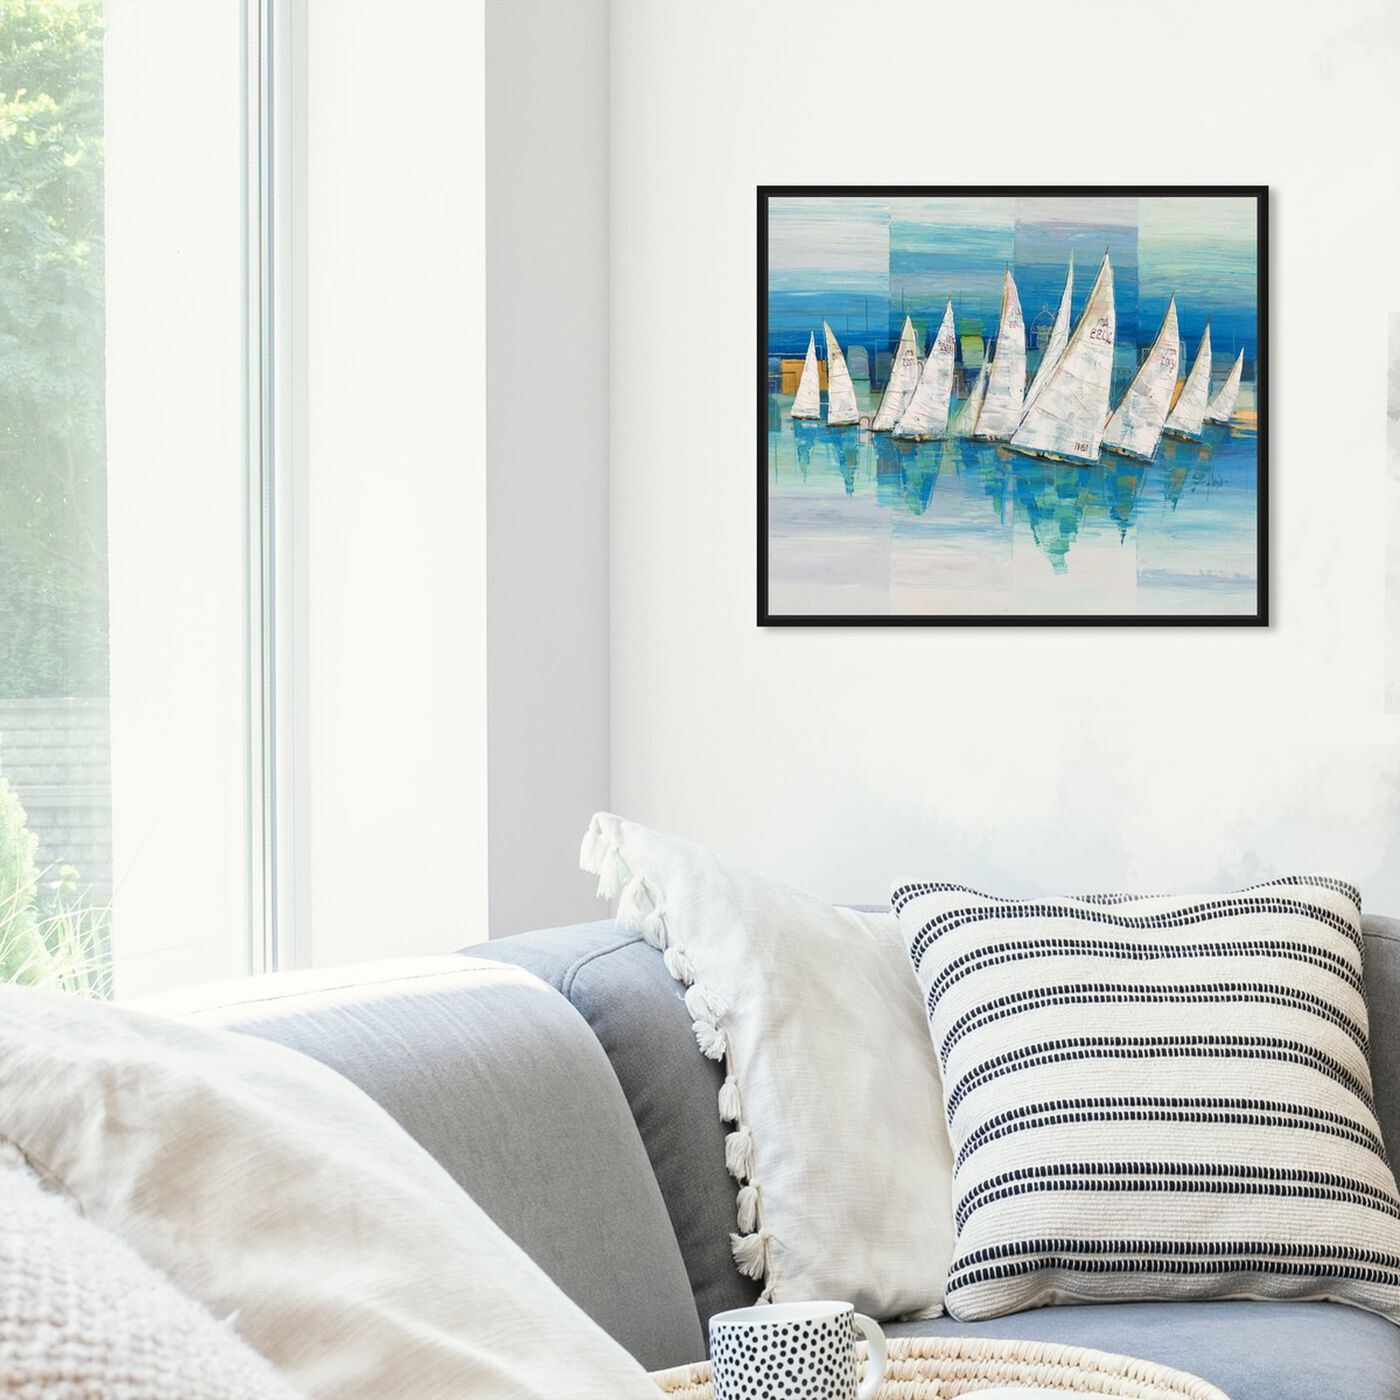 Hanging view of Sai - Speculum Oceano 3LR1345 featuring nautical and coastal and coastal art.